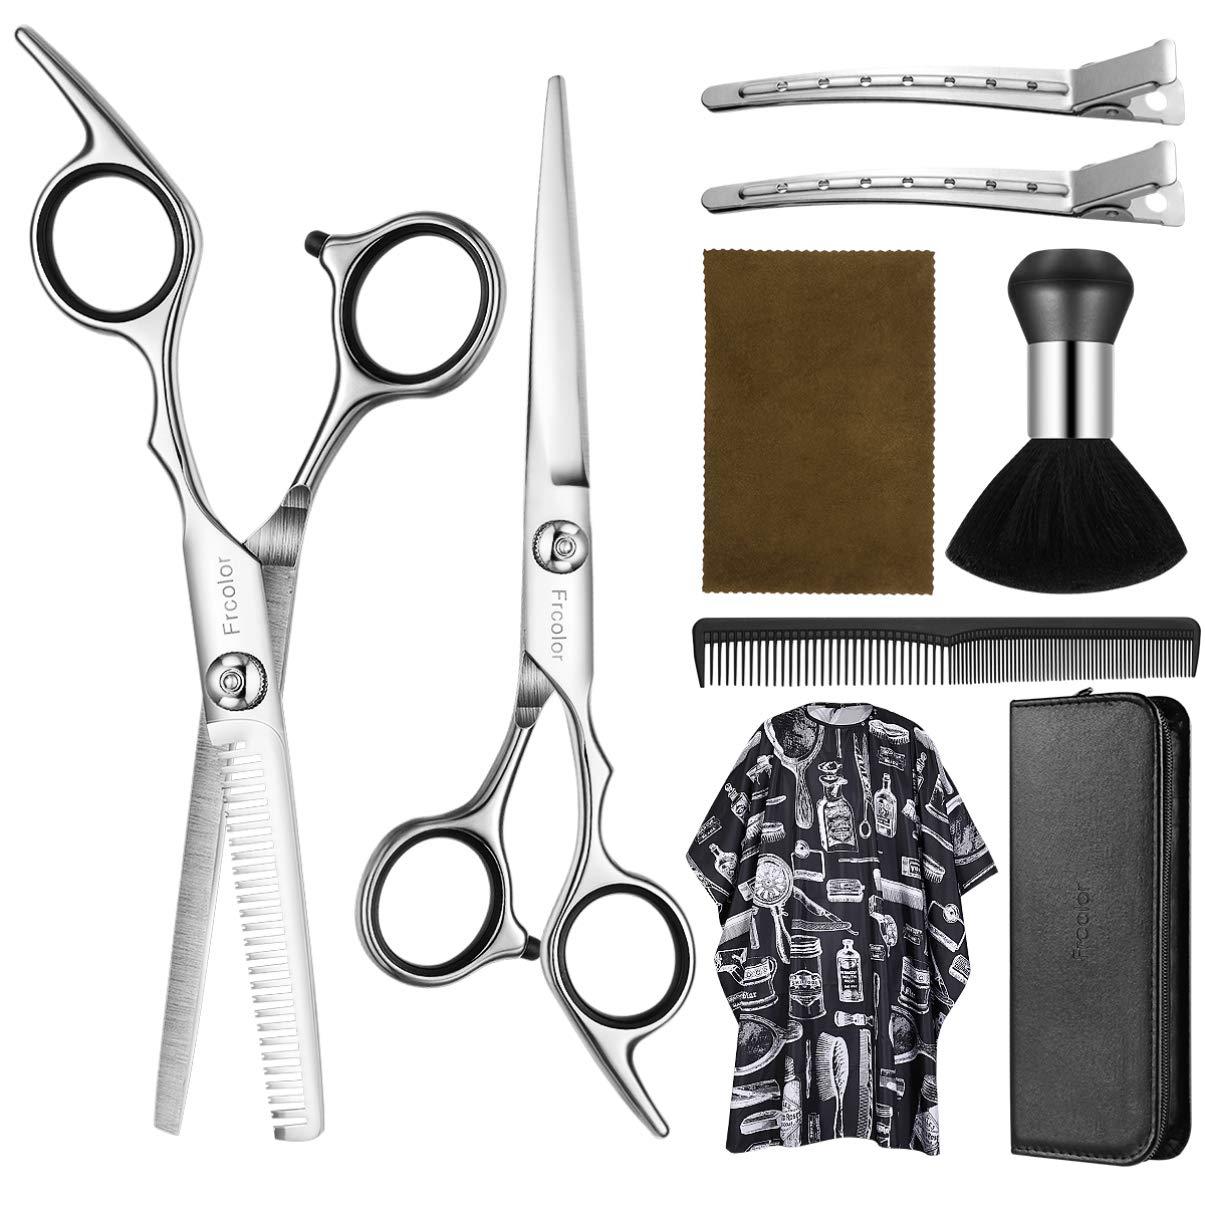 Hair Cutting Scissors Set 6.7 Inch, Frcolor 9 Pcs Stainless Steel Hair Cutting Shears Hairdressing Scissors Professional Hair Shear Kit For Men Women Pet